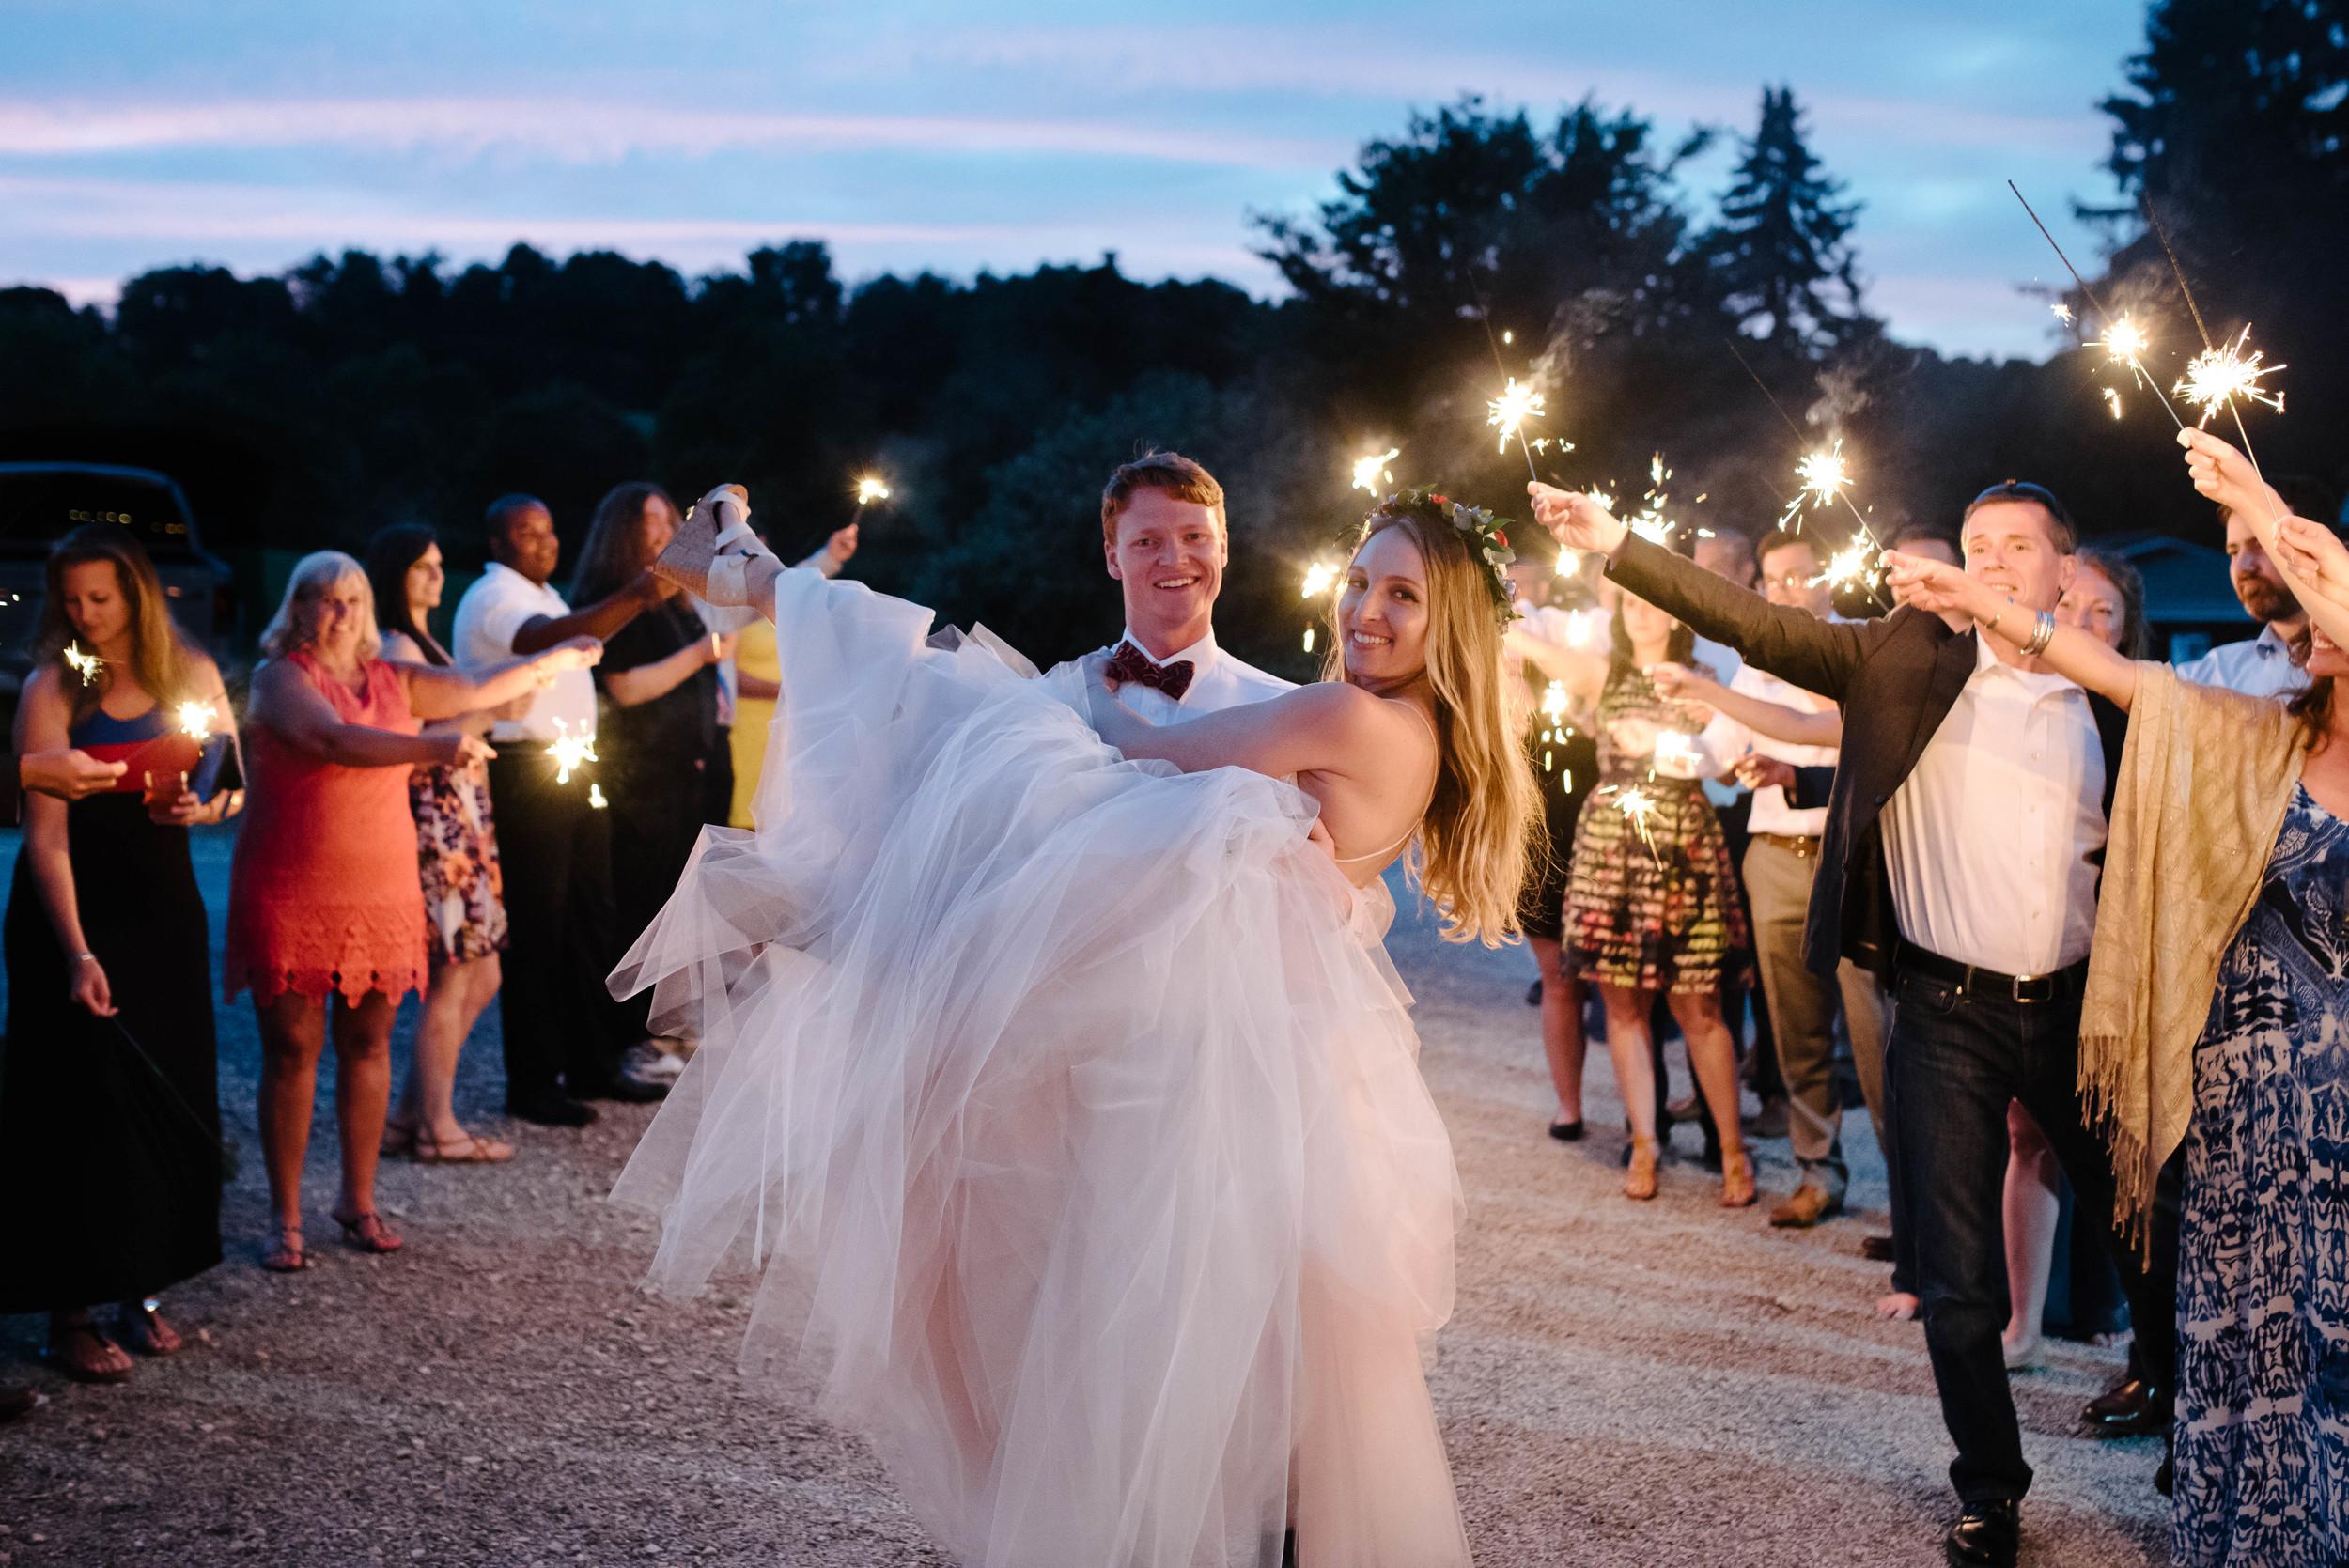 lingrow farm wedding sparklers mariah fisher.jpg